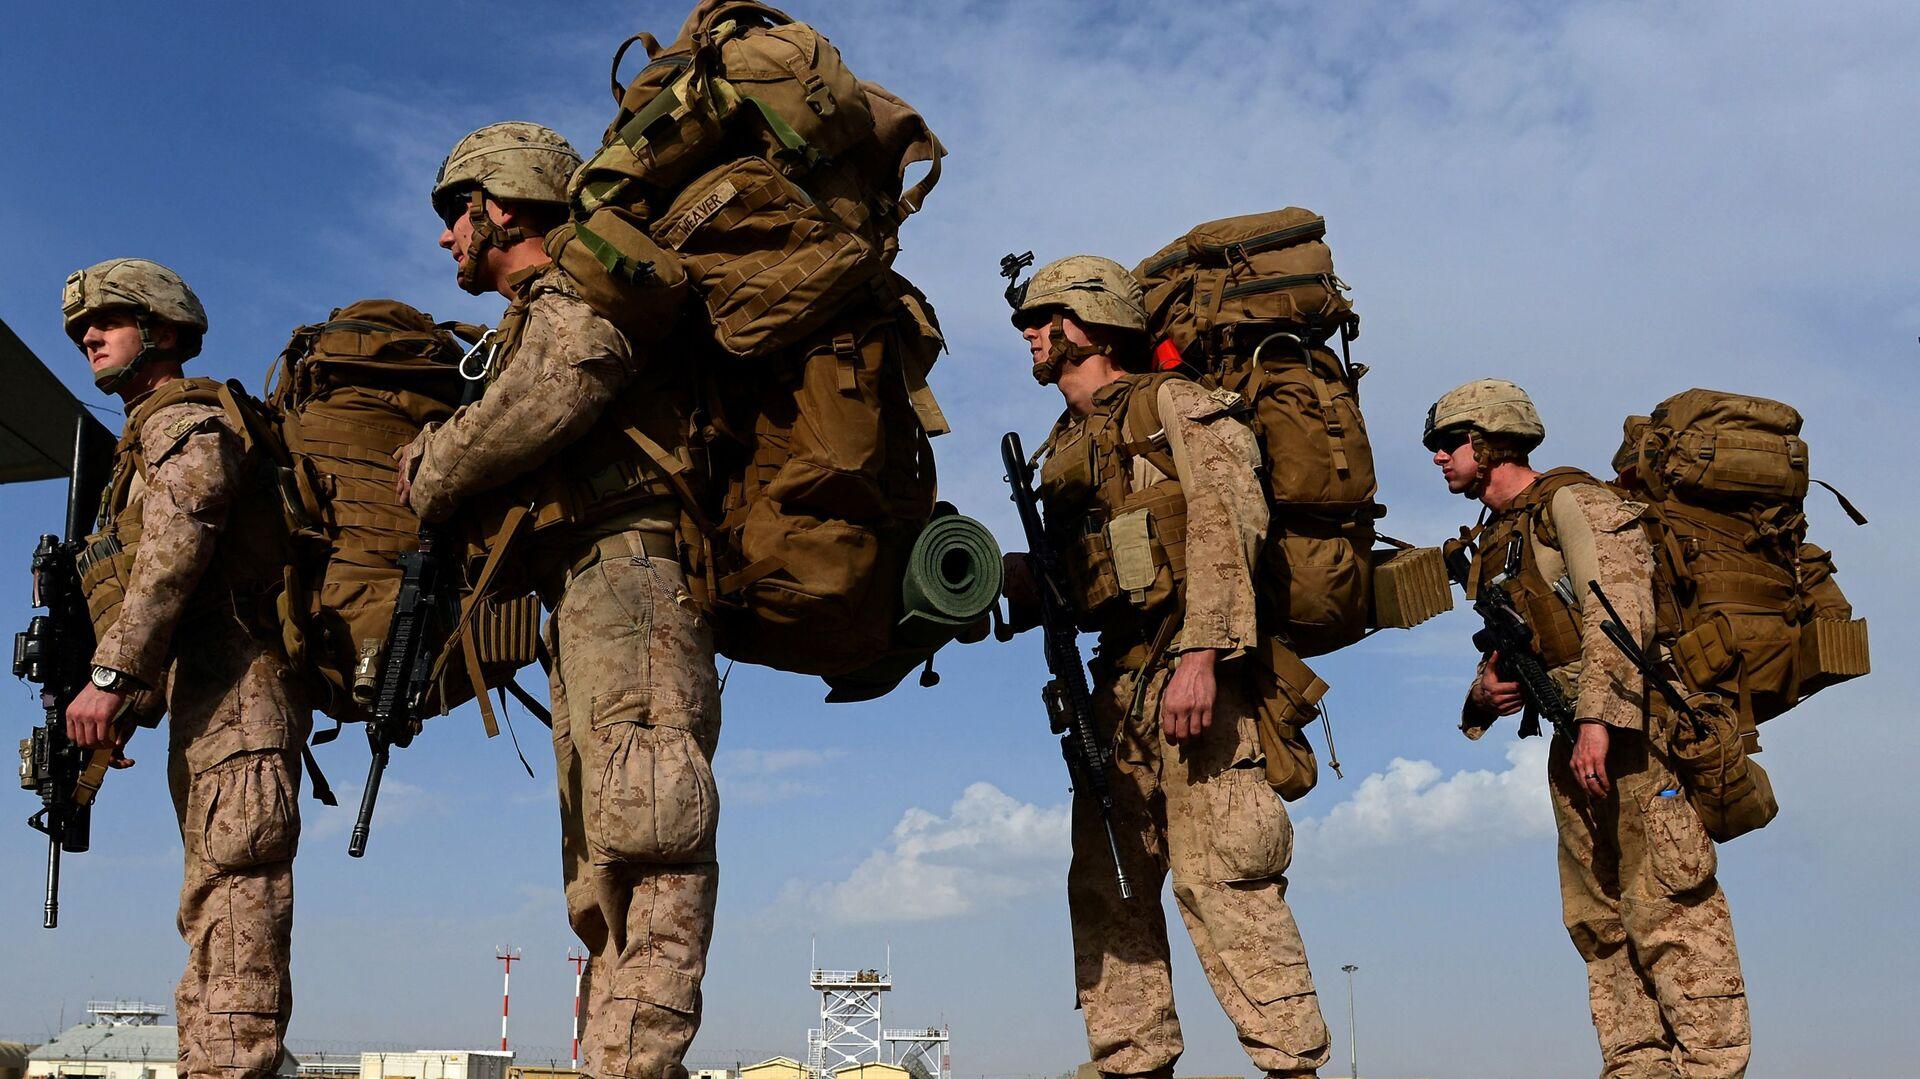 I Marines degli Stati Uniti in Afghanistan - Sputnik Italia, 1920, 09.05.2021